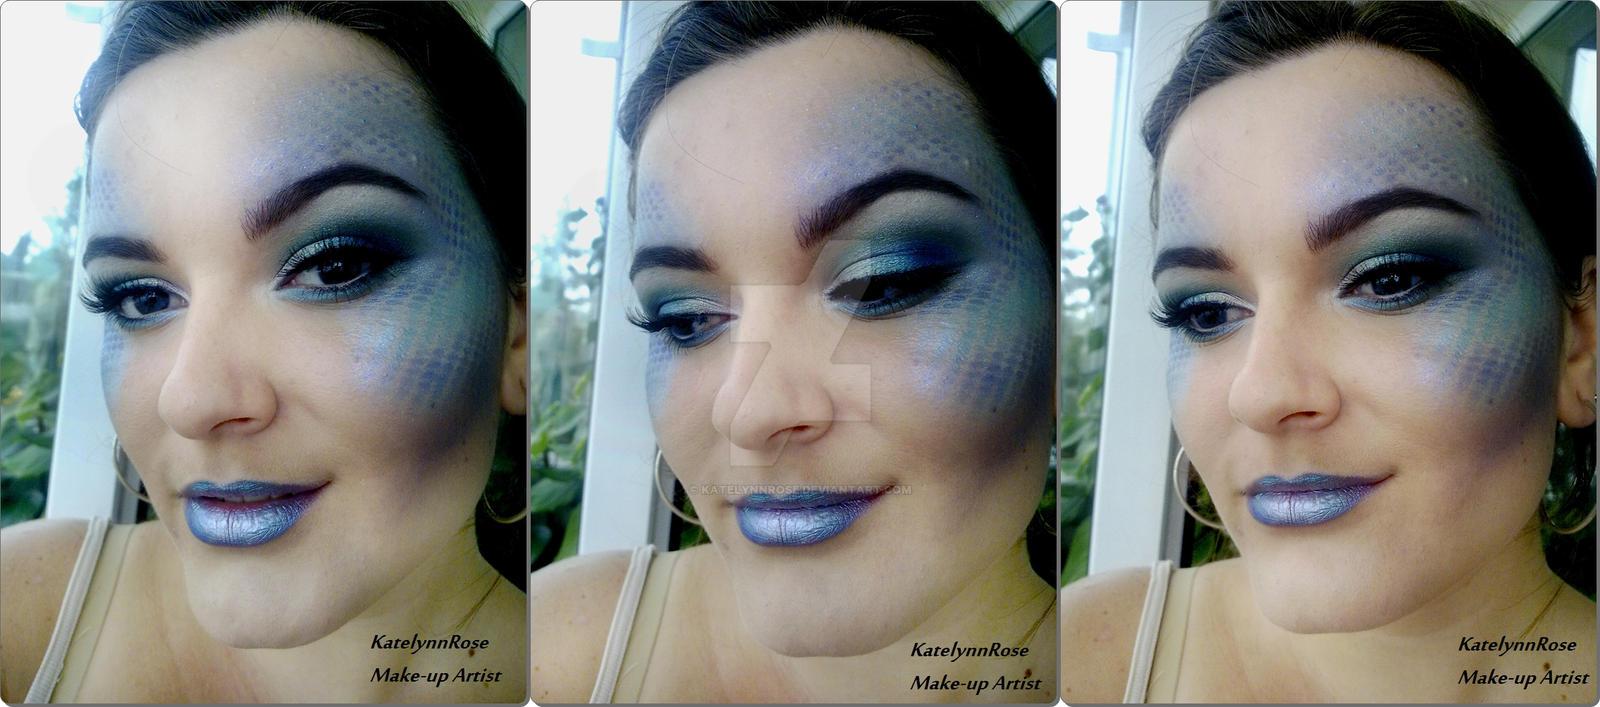 Halloween makeup: Mermaid by KatelynnRose on DeviantArt